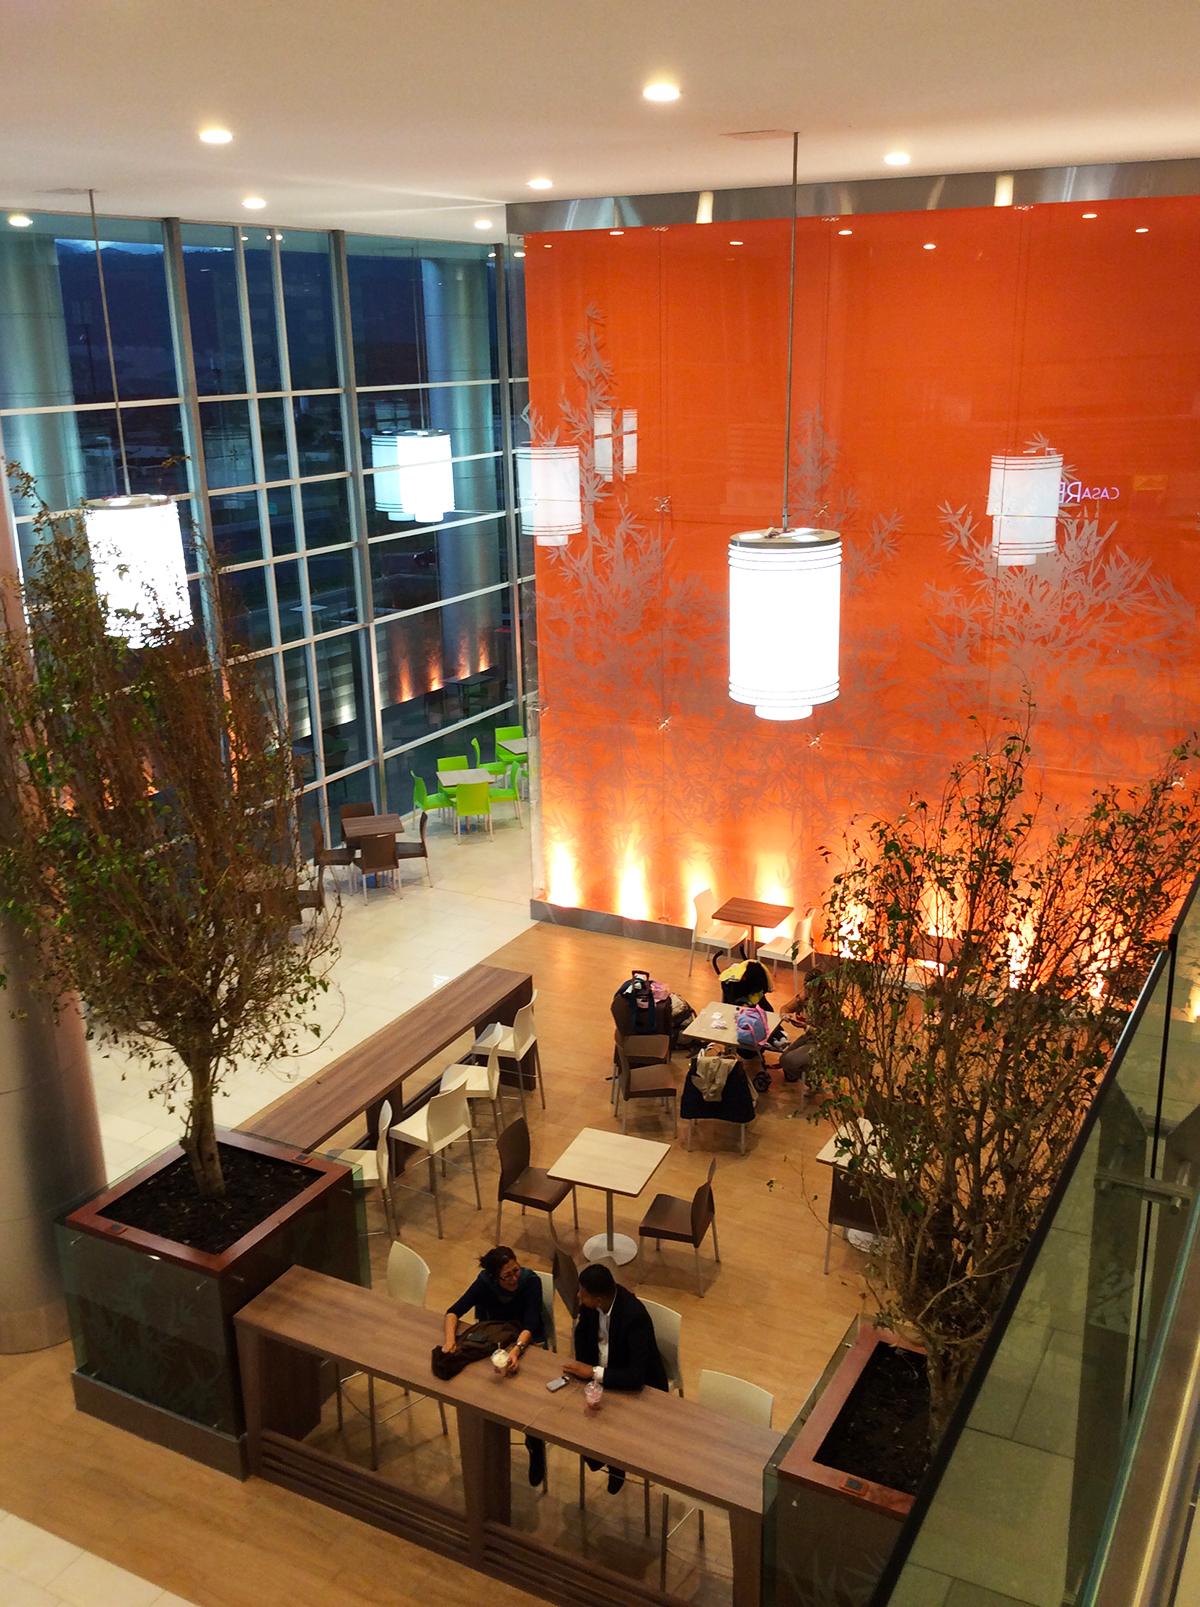 Quito Airport Center Design Architect Firm